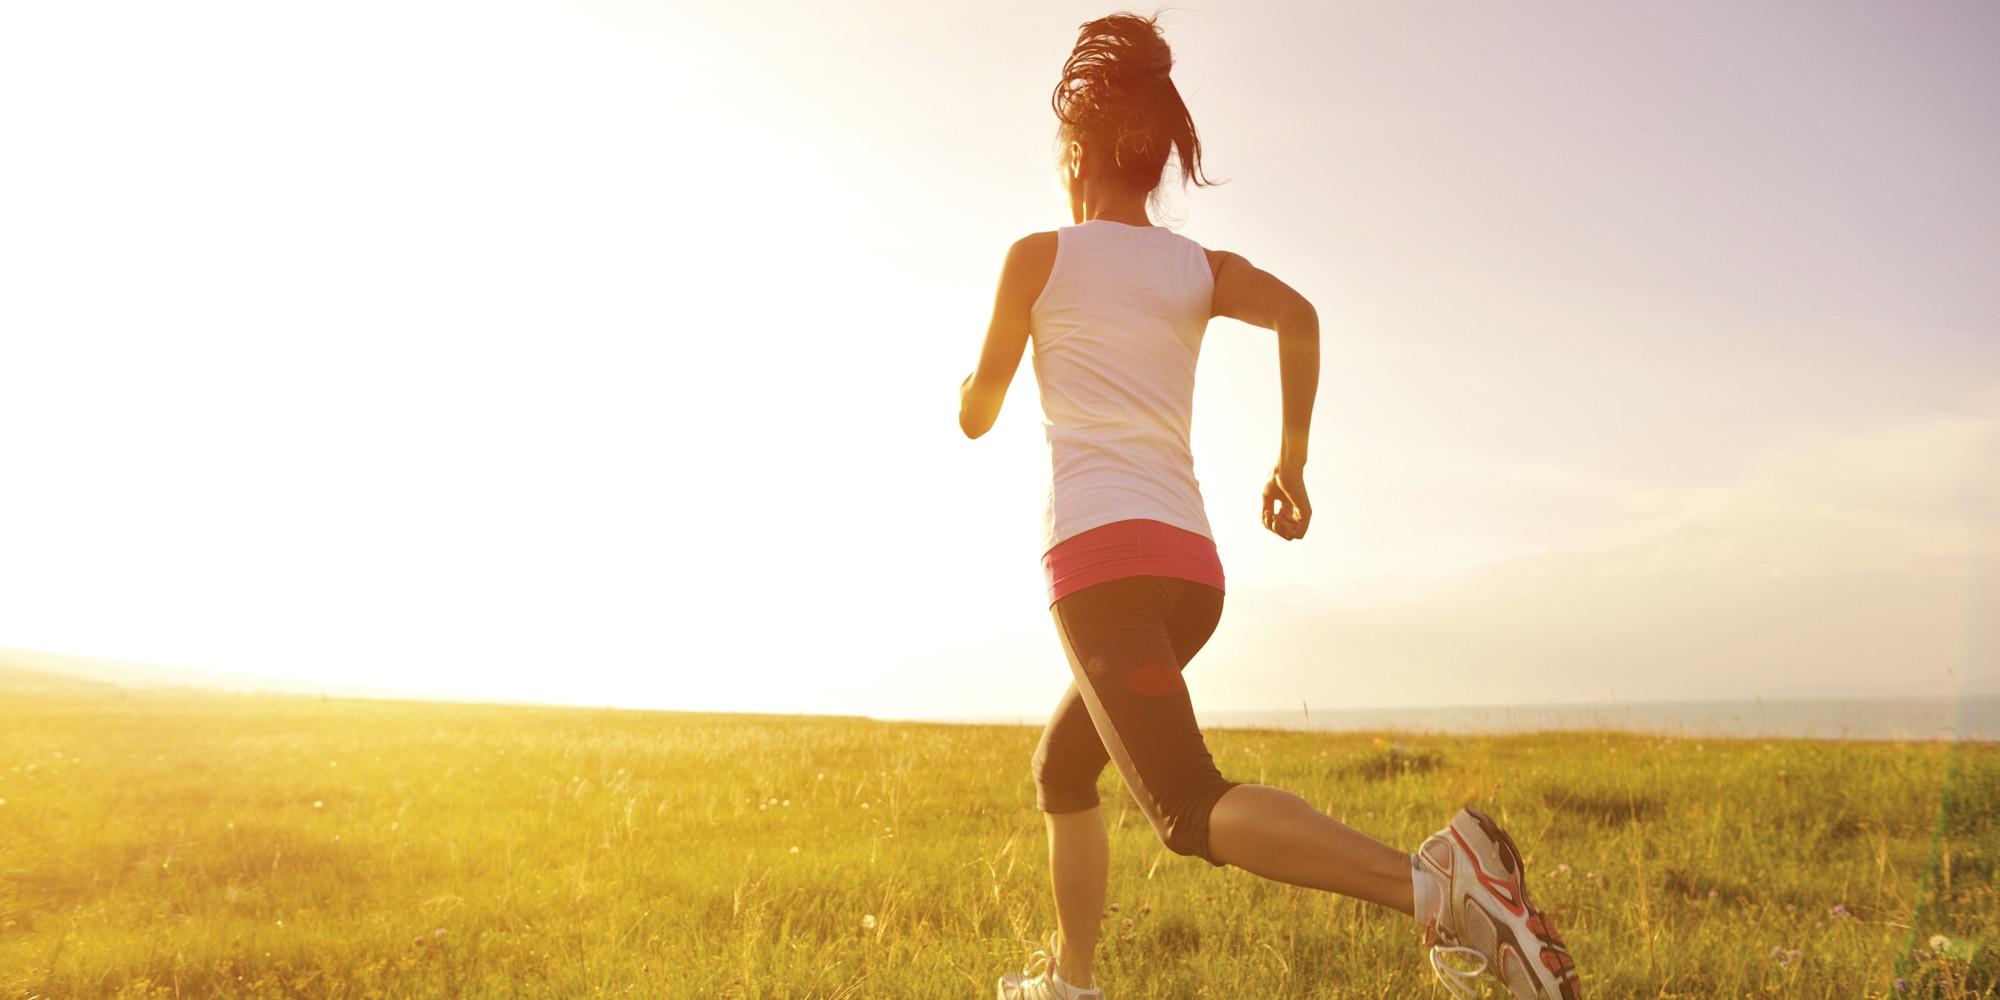 running-exercise-workout.jpg